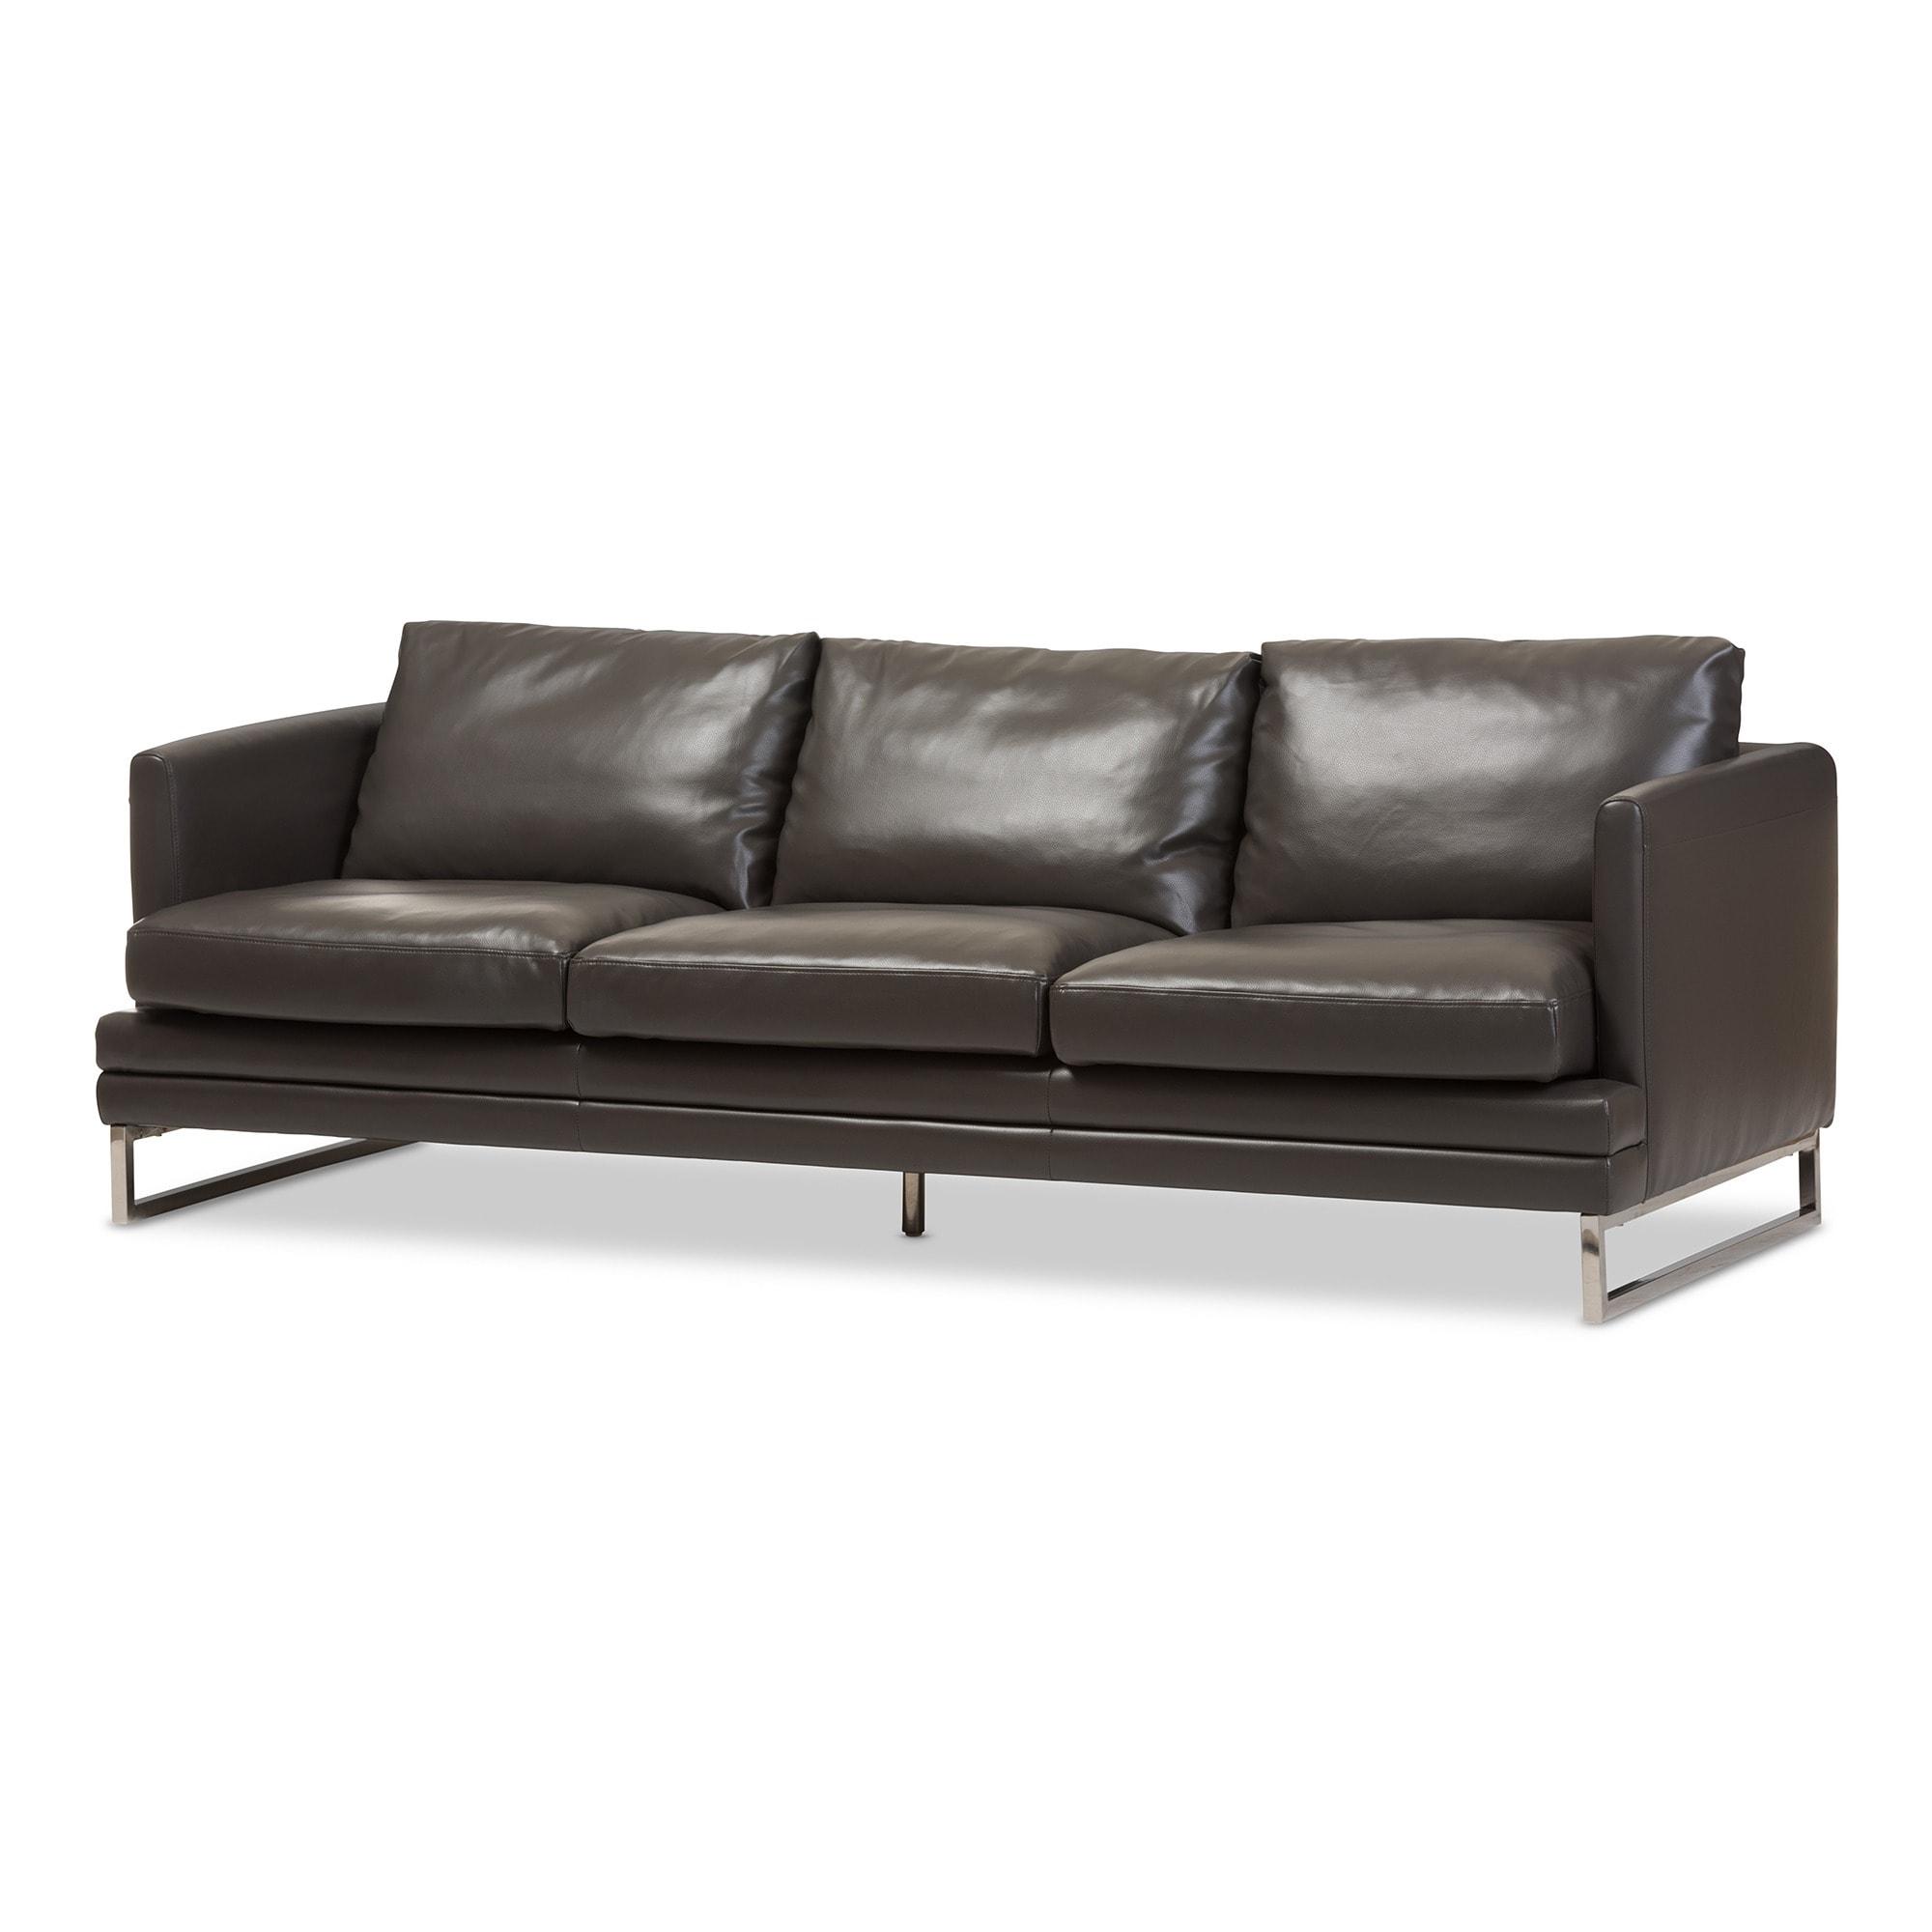 Baxton Studio Dakota Pewter Grey Leather Modern Sofa Free  # Muebles Mundo Box